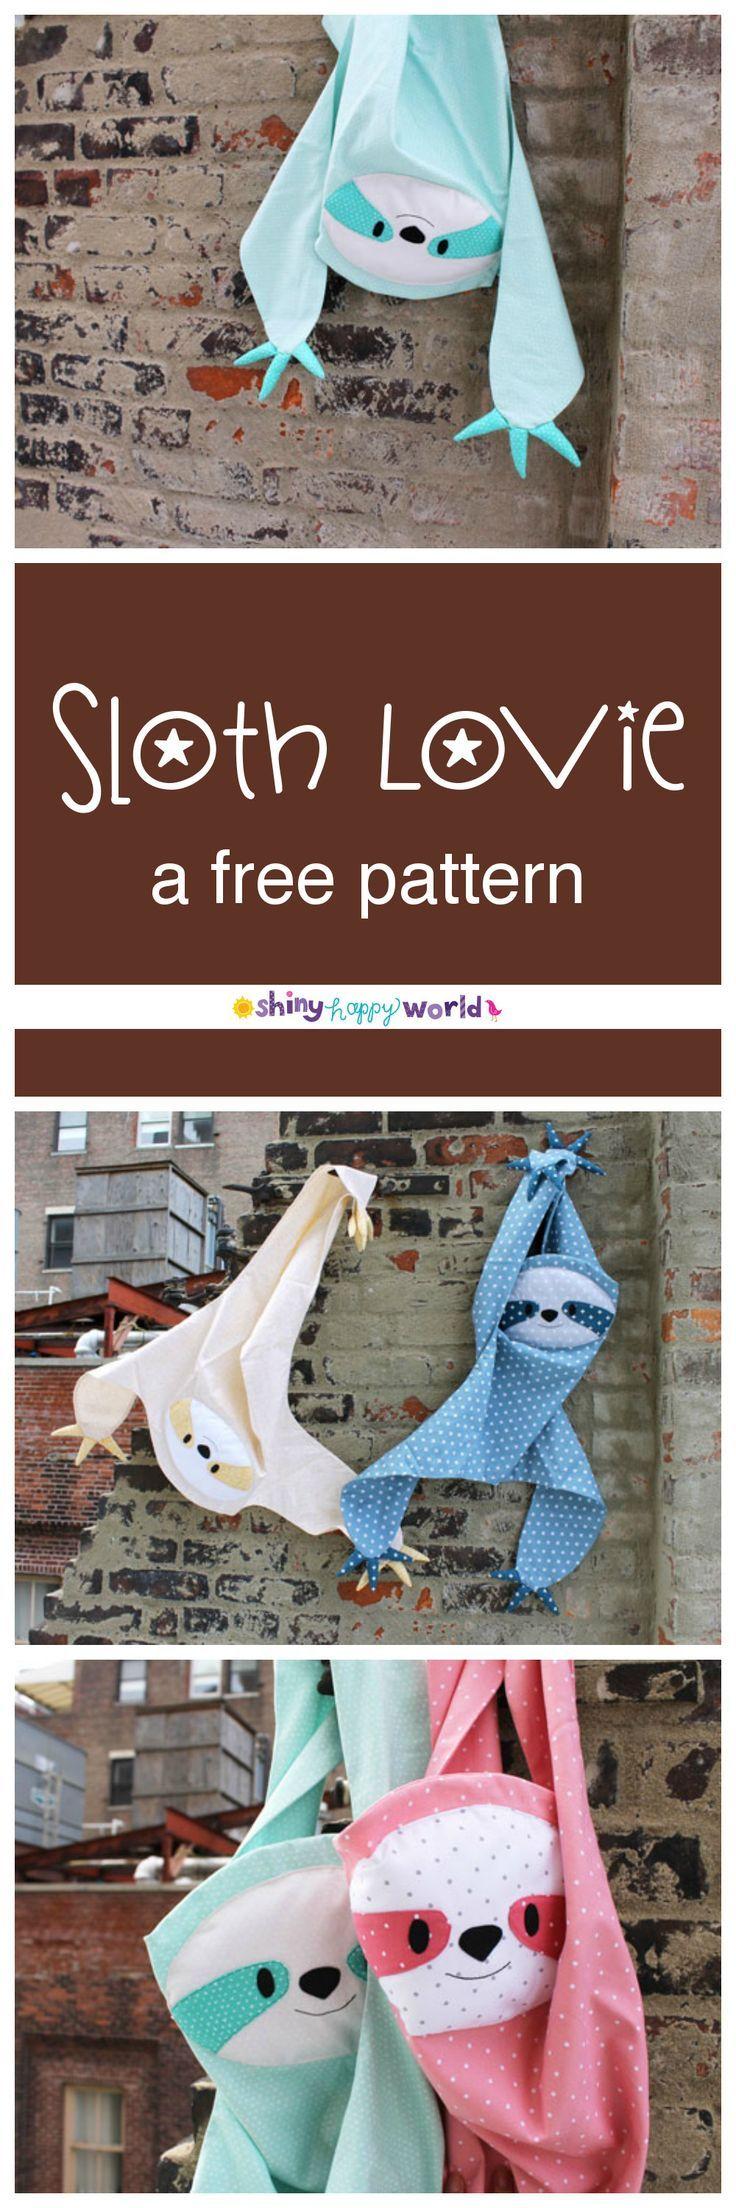 Sloth Lovie a free pattern 298